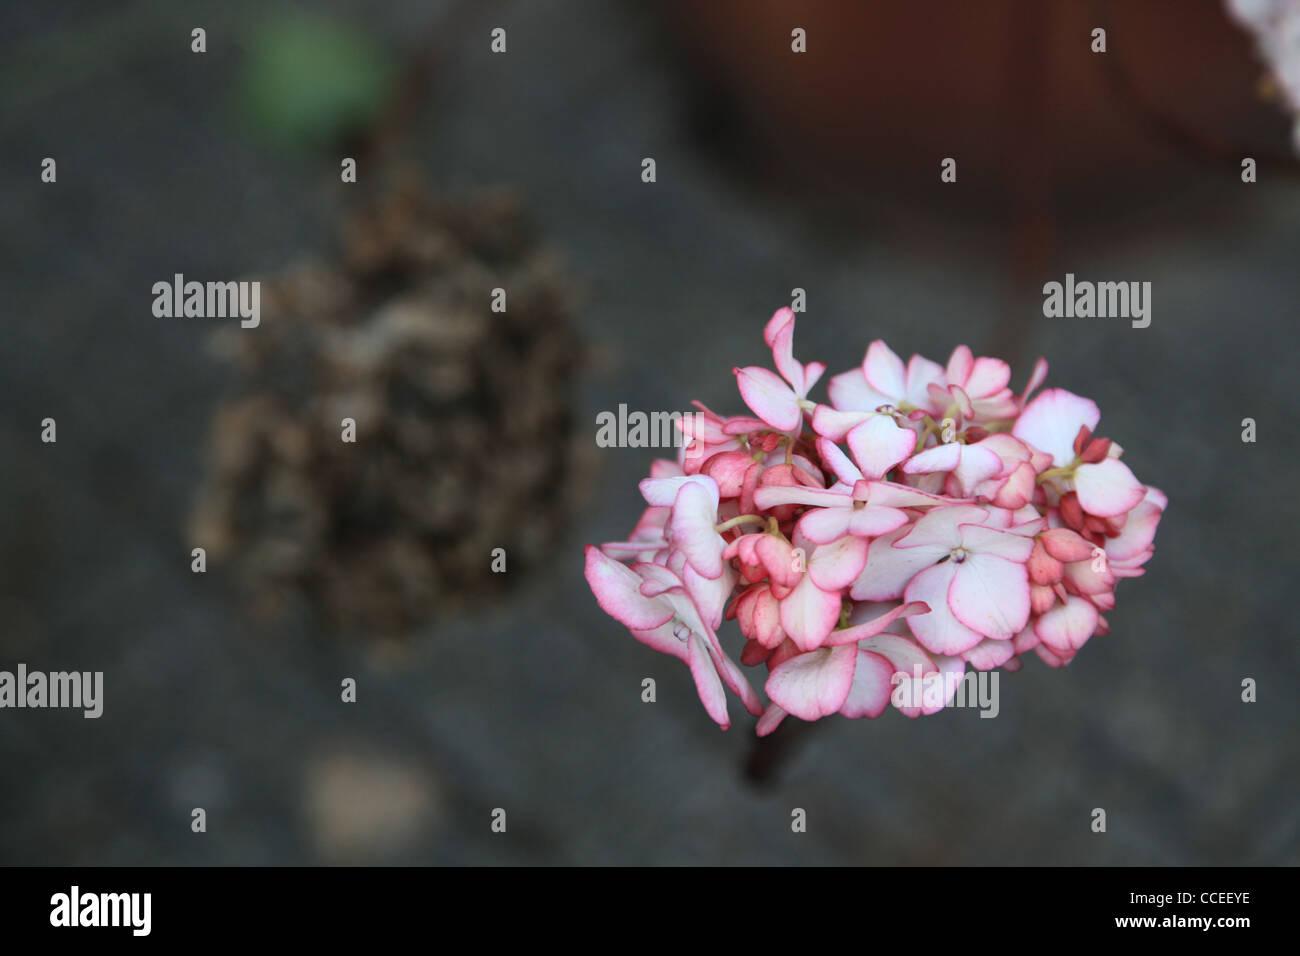 Hortensie, rose,rot,Winter,Blüte,weiss,hydrangea,pink,red,white,blossom,blom,Blume,flower,Pflaster,strahlend,Kontrast,Detail - Stock Image